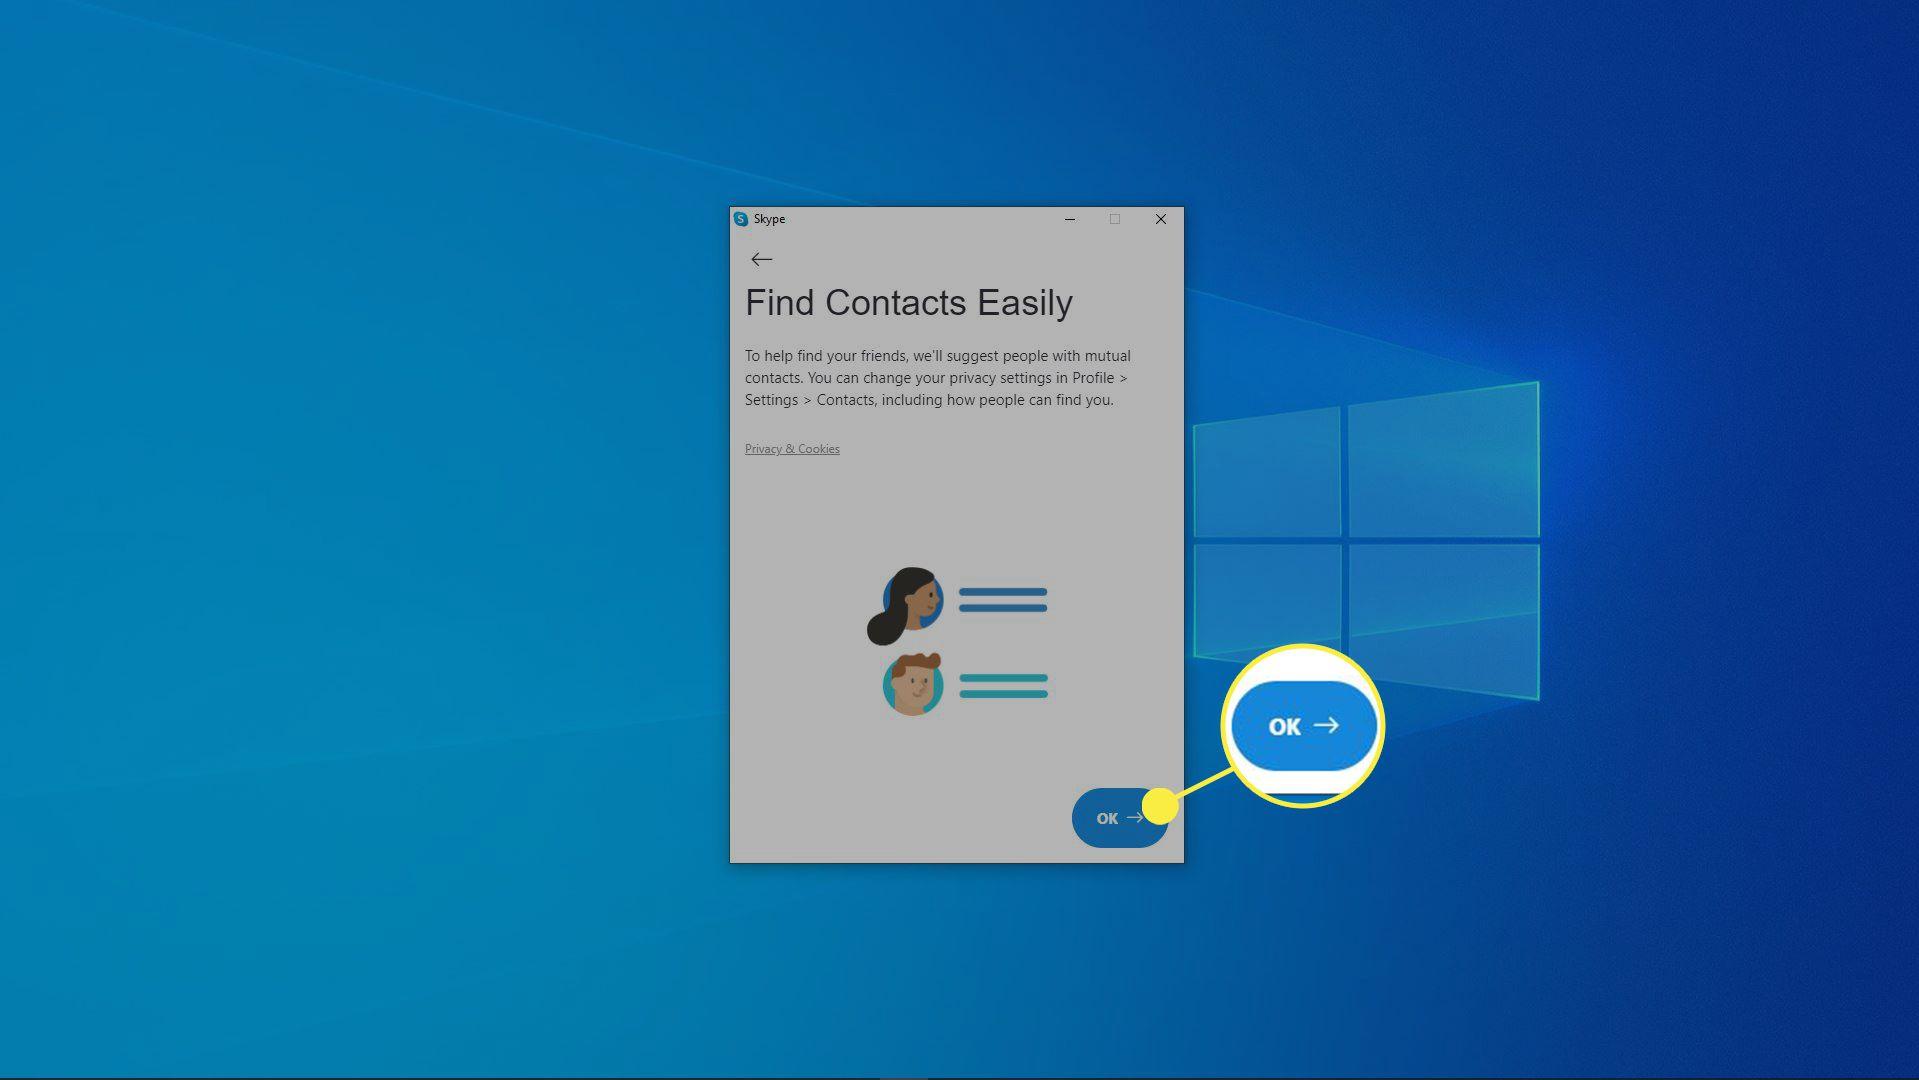 A screenshot of the Skype installation process.